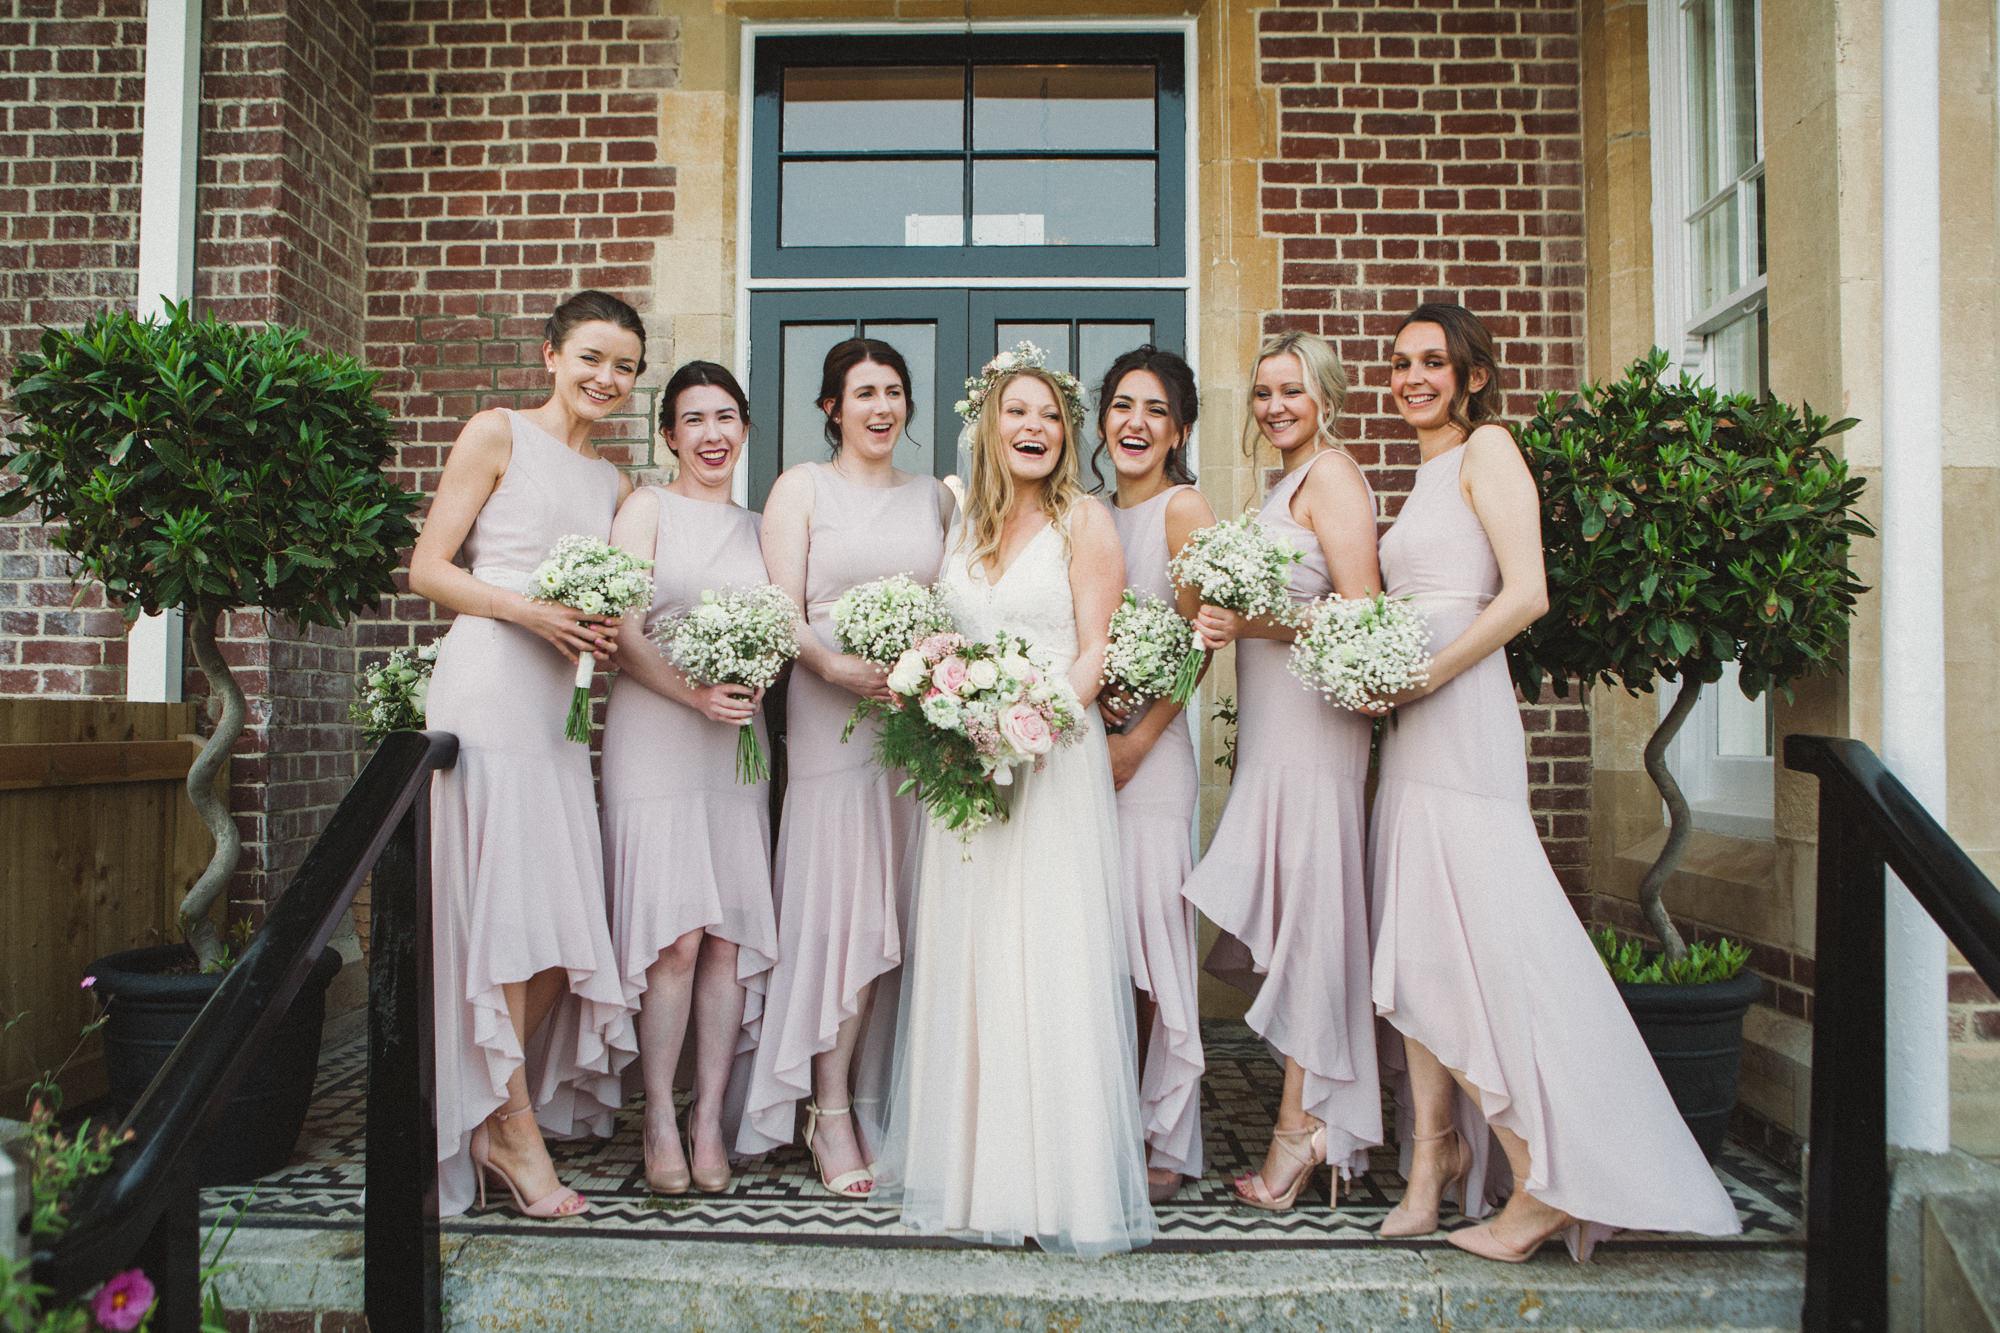 401eca1a21dba A Bride in Blush Pink Catherine Deane for a Coastal Meets Country Wedding  in Salcombe, Devon   Love My Dress® UK Wedding Blog + Wedding Directory